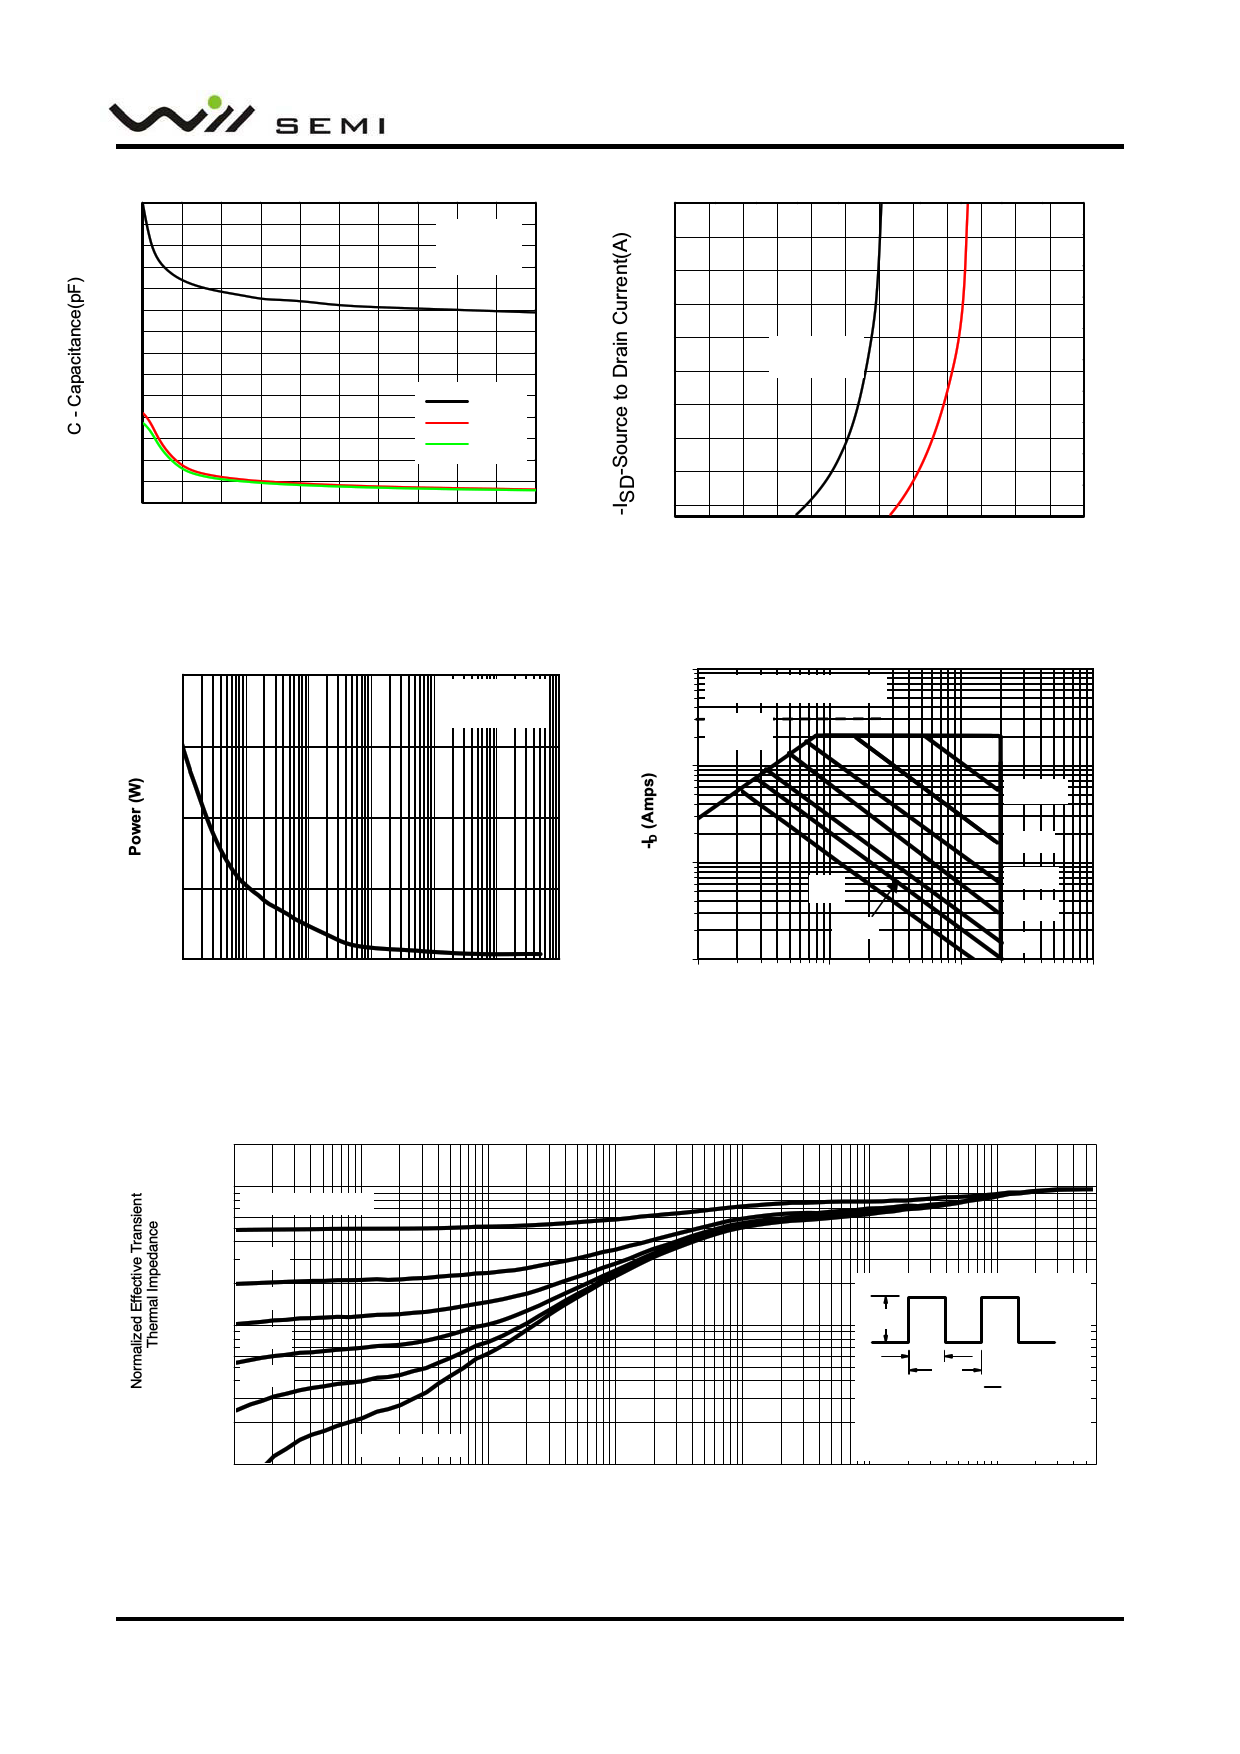 WPM2037 pdf, arduino